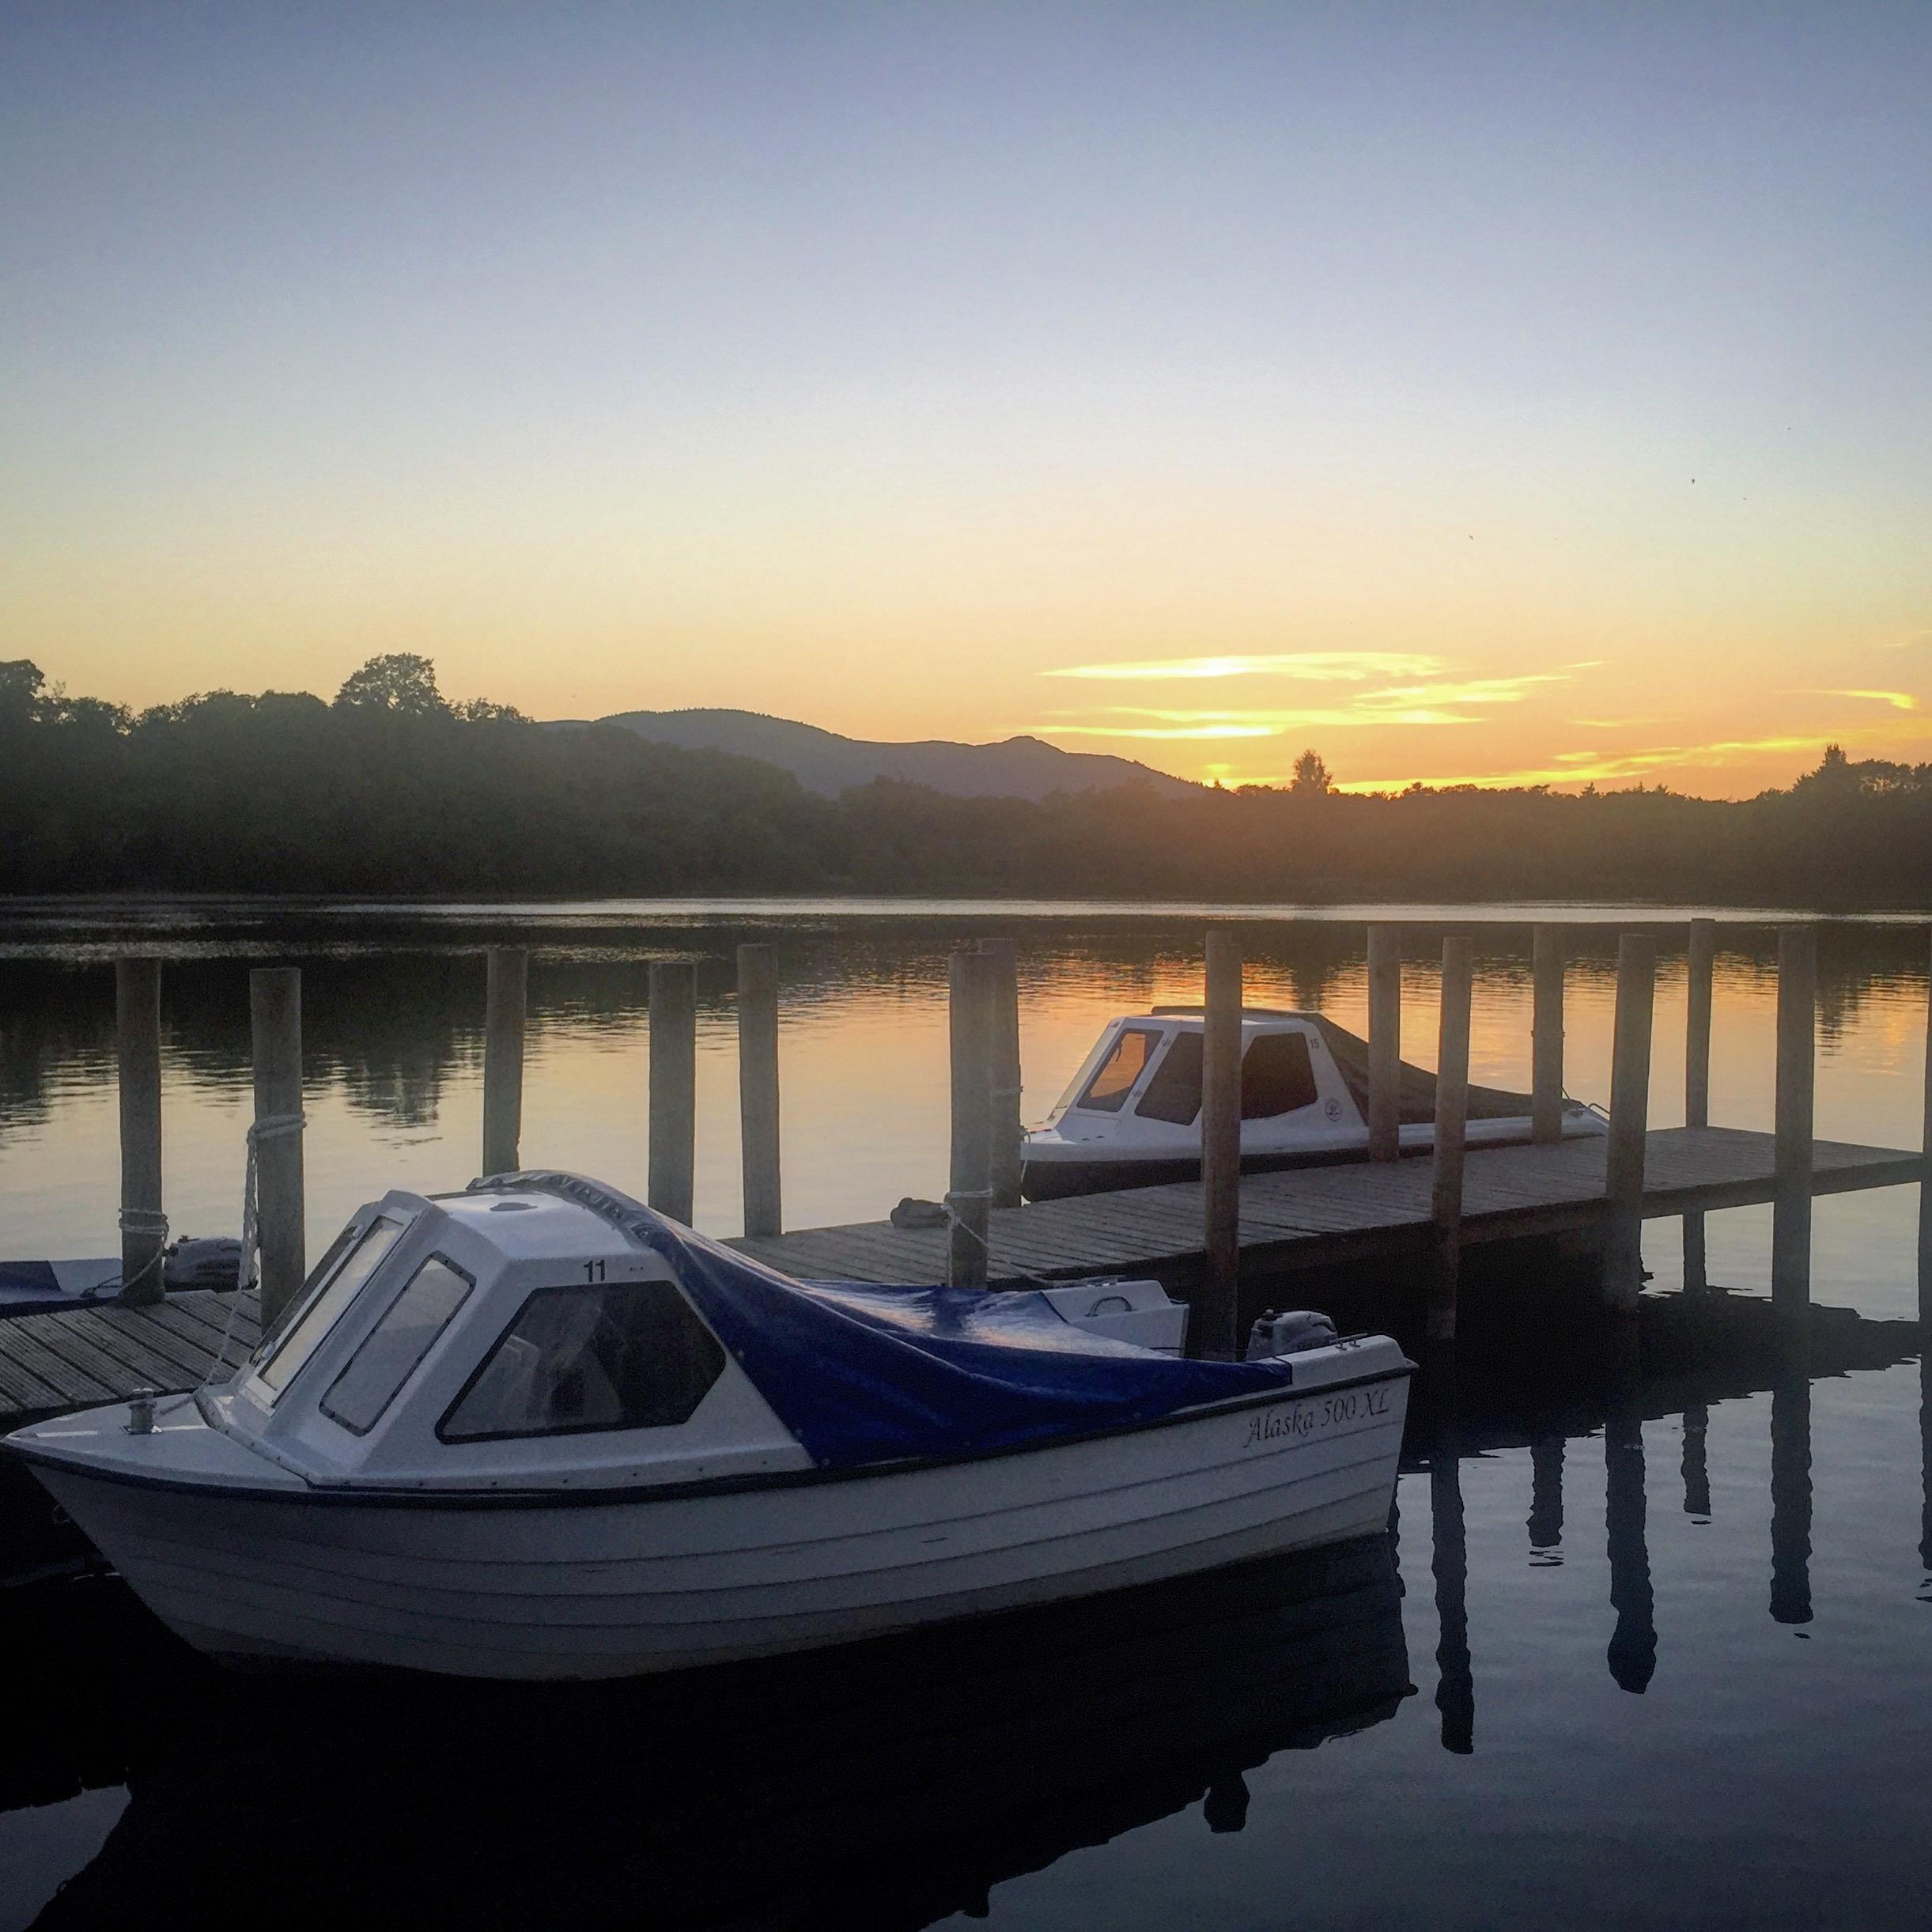 boats sunset.JPG